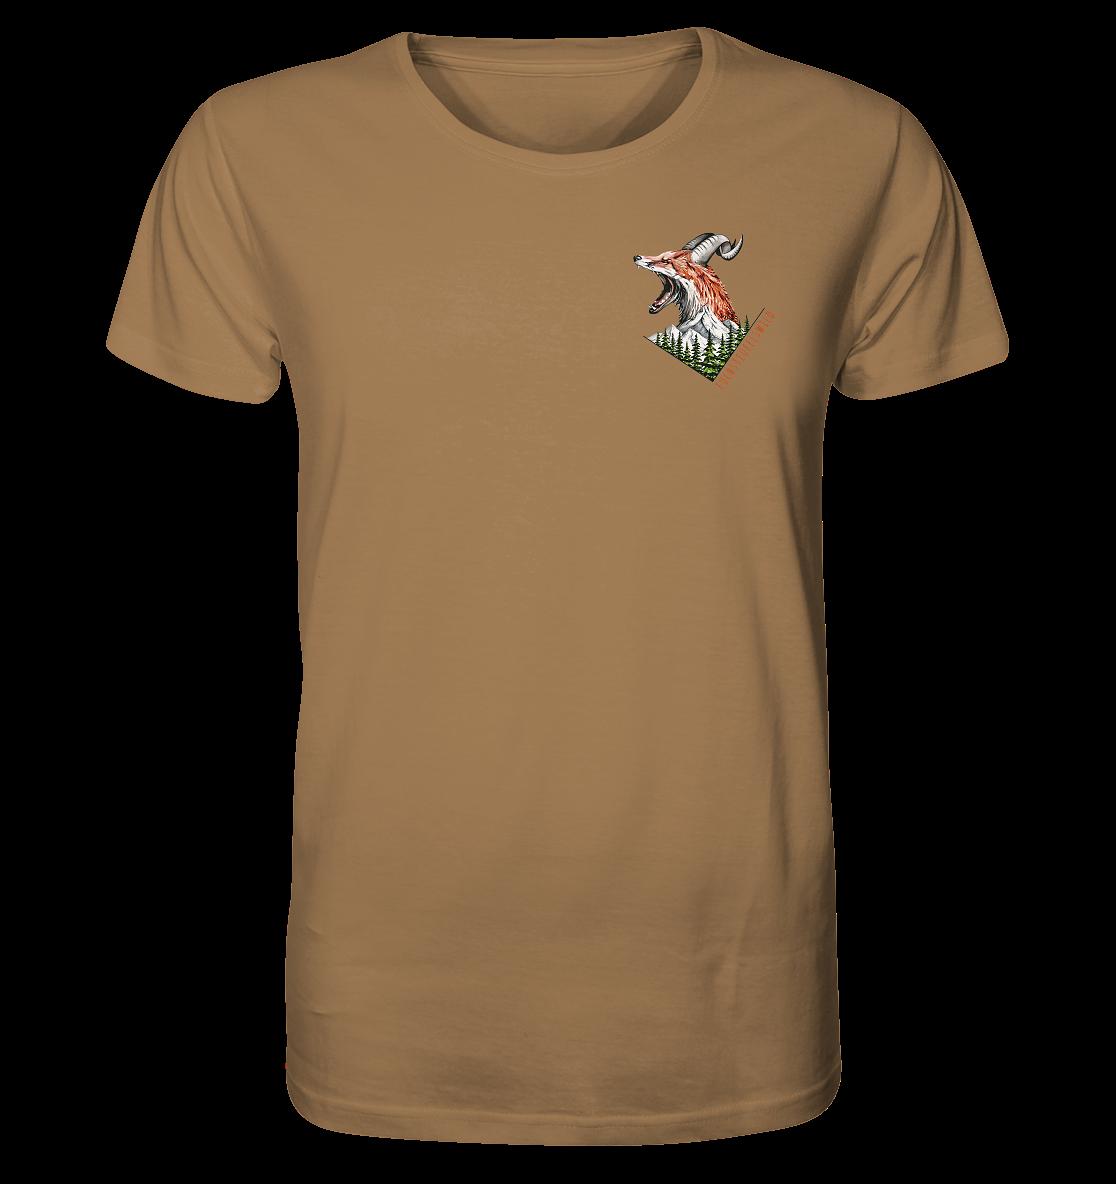 front-organic-shirt-a17c55-1116x-1.png